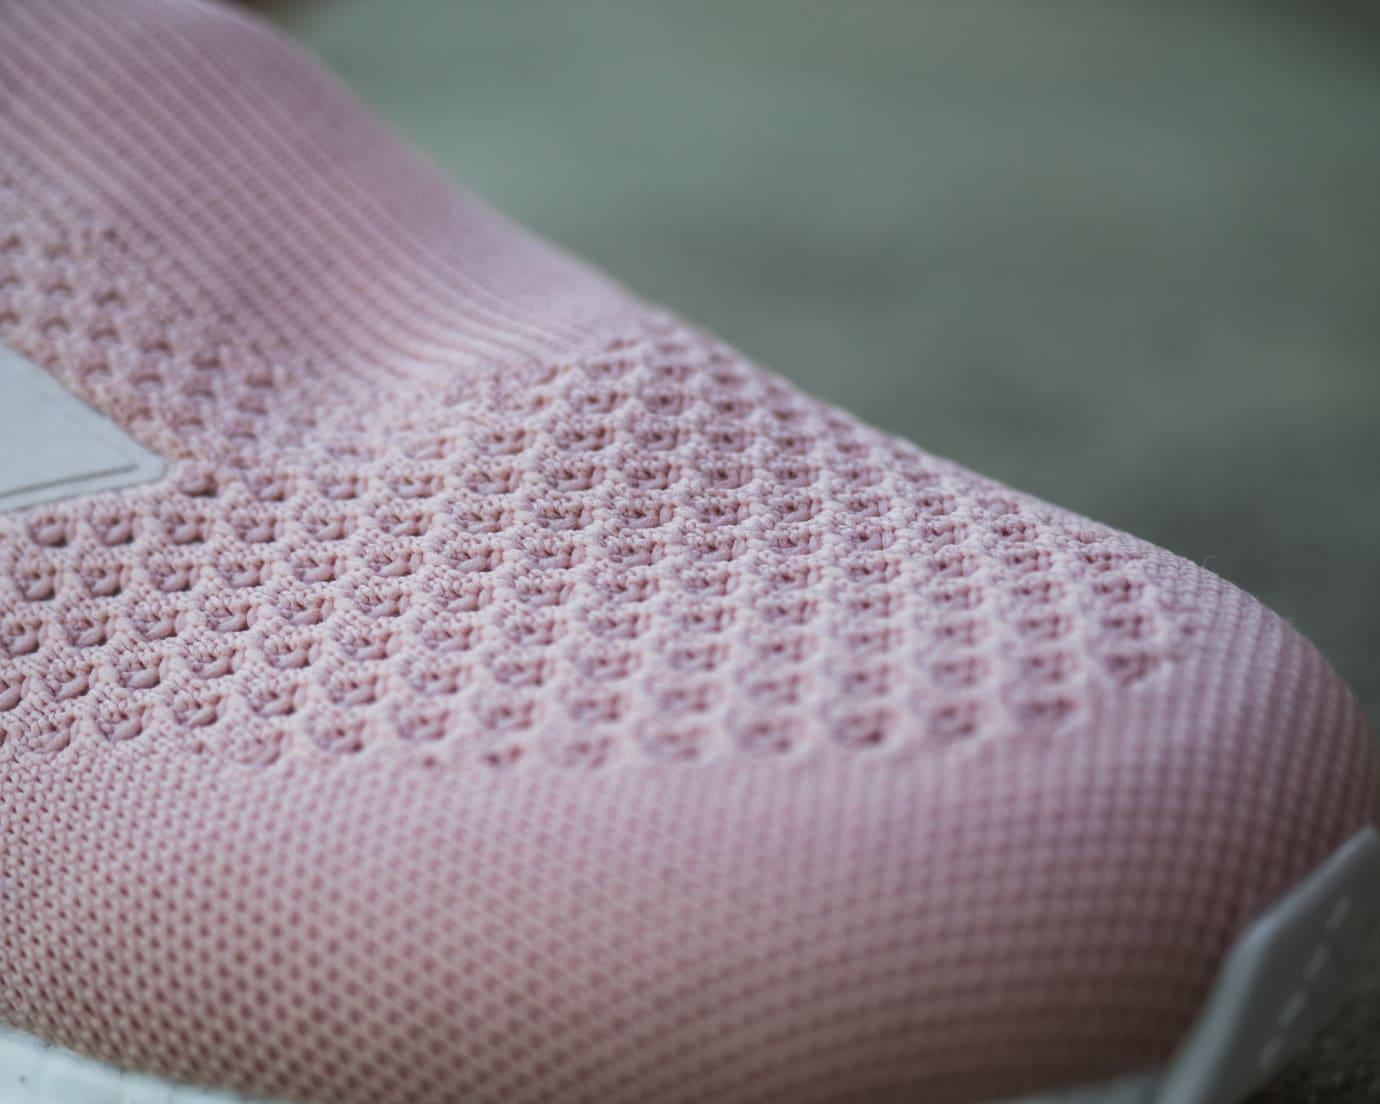 new style 33ae5 bd79a ... Kith Adidas Ultra Boost Ace 16 Pure Control Flamingo Toe